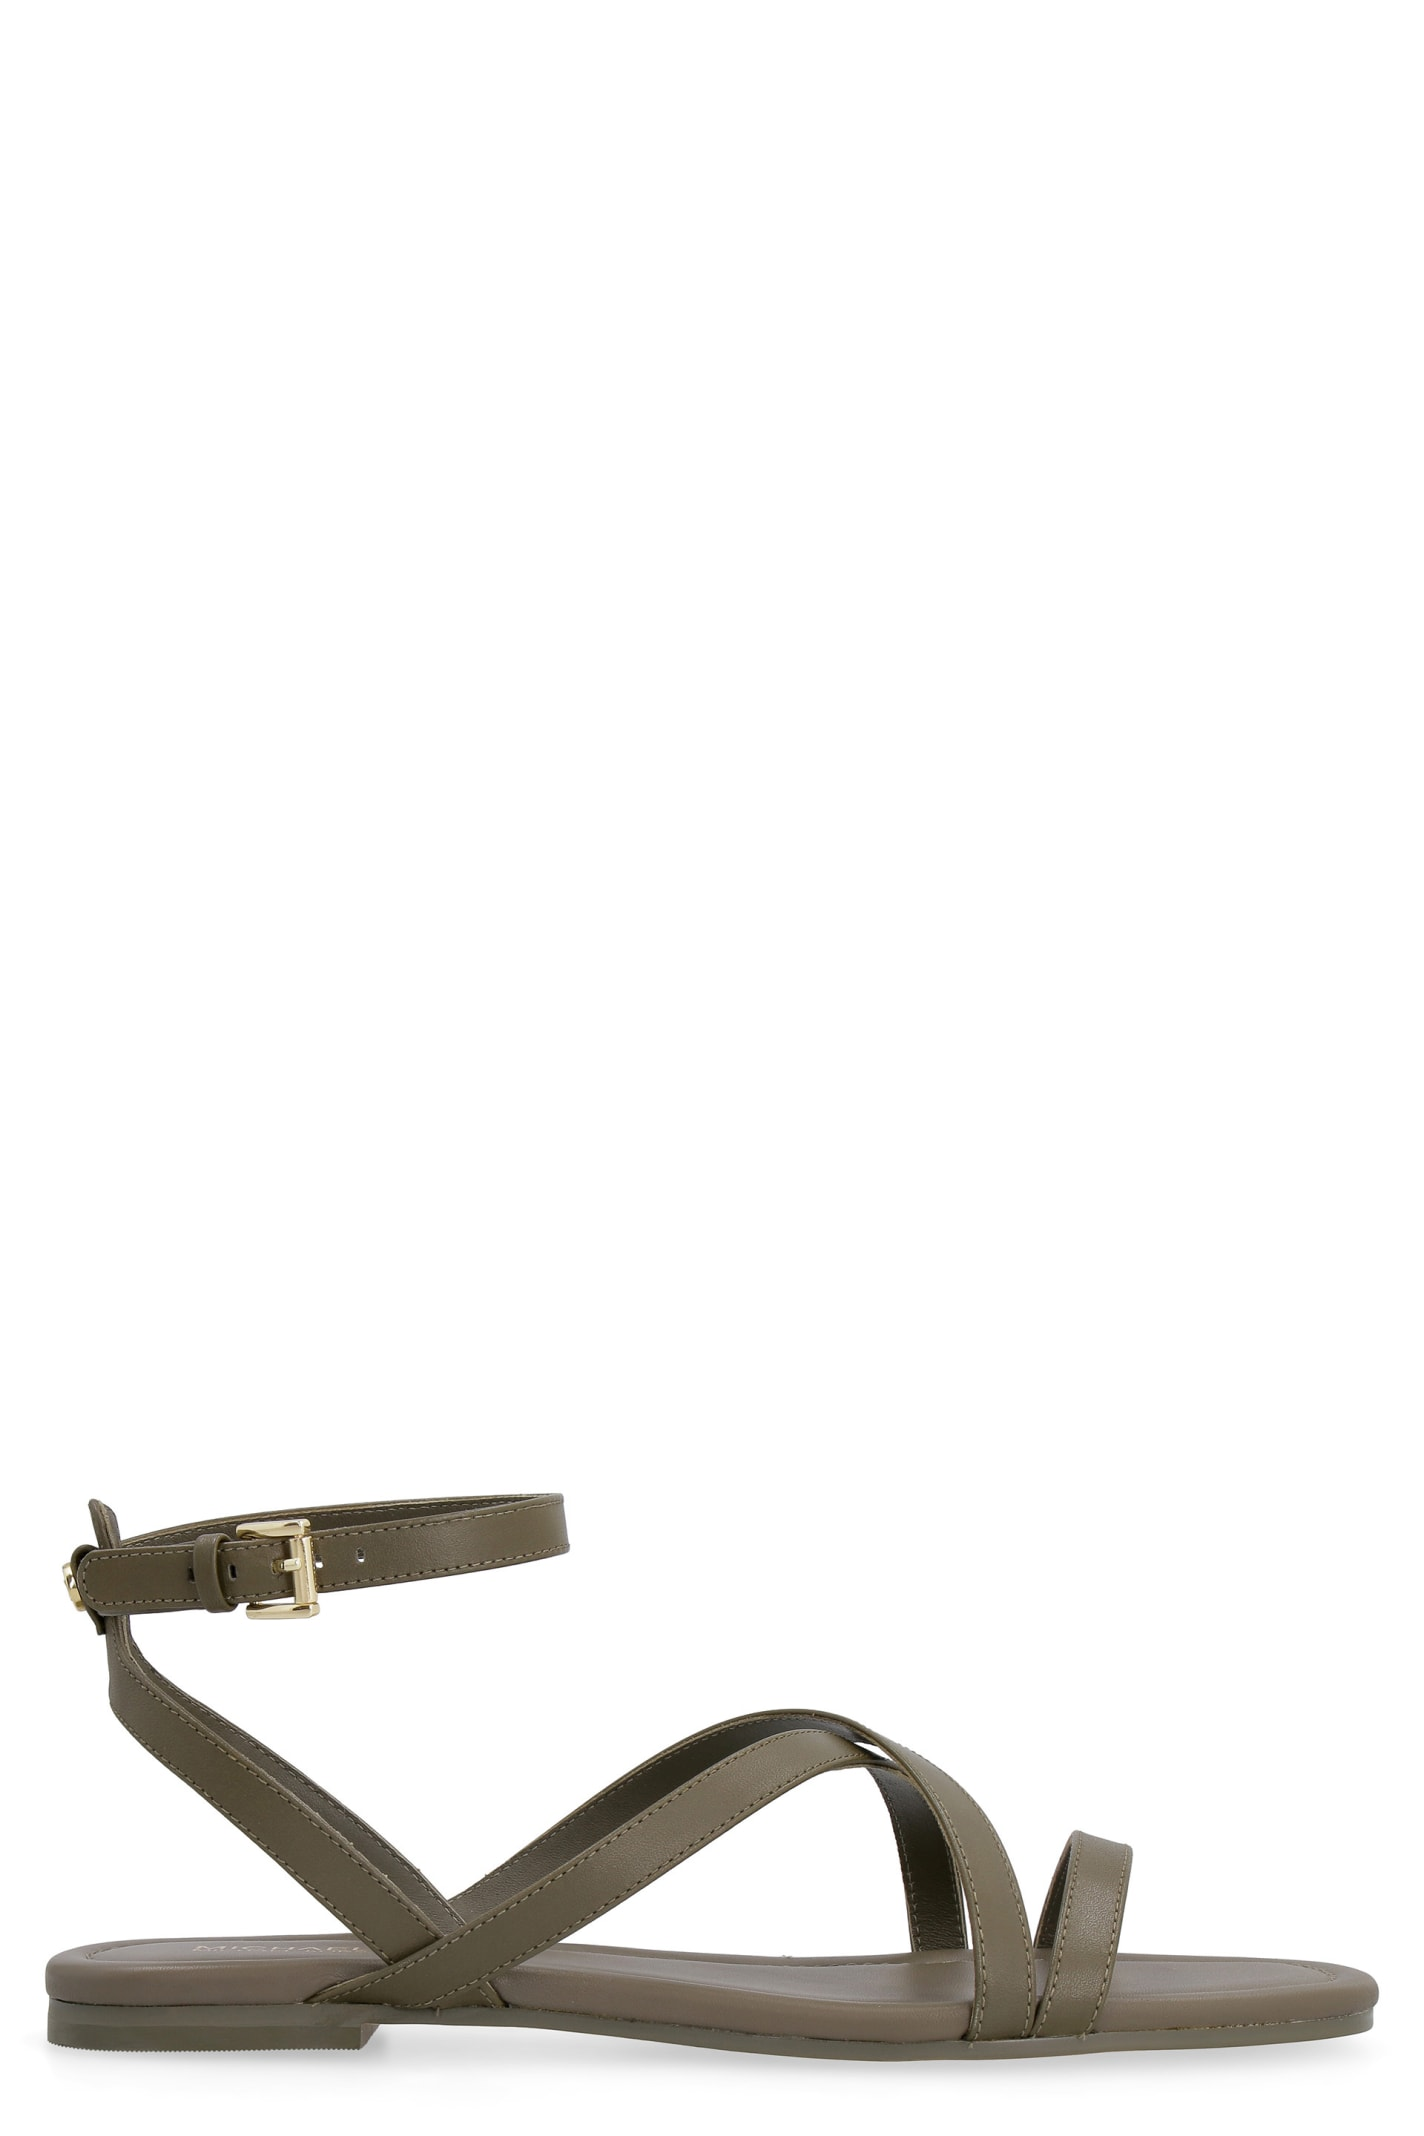 Buy MICHAEL Michael Kors Tasha Leather Sandals online, shop MICHAEL Michael Kors shoes with free shipping